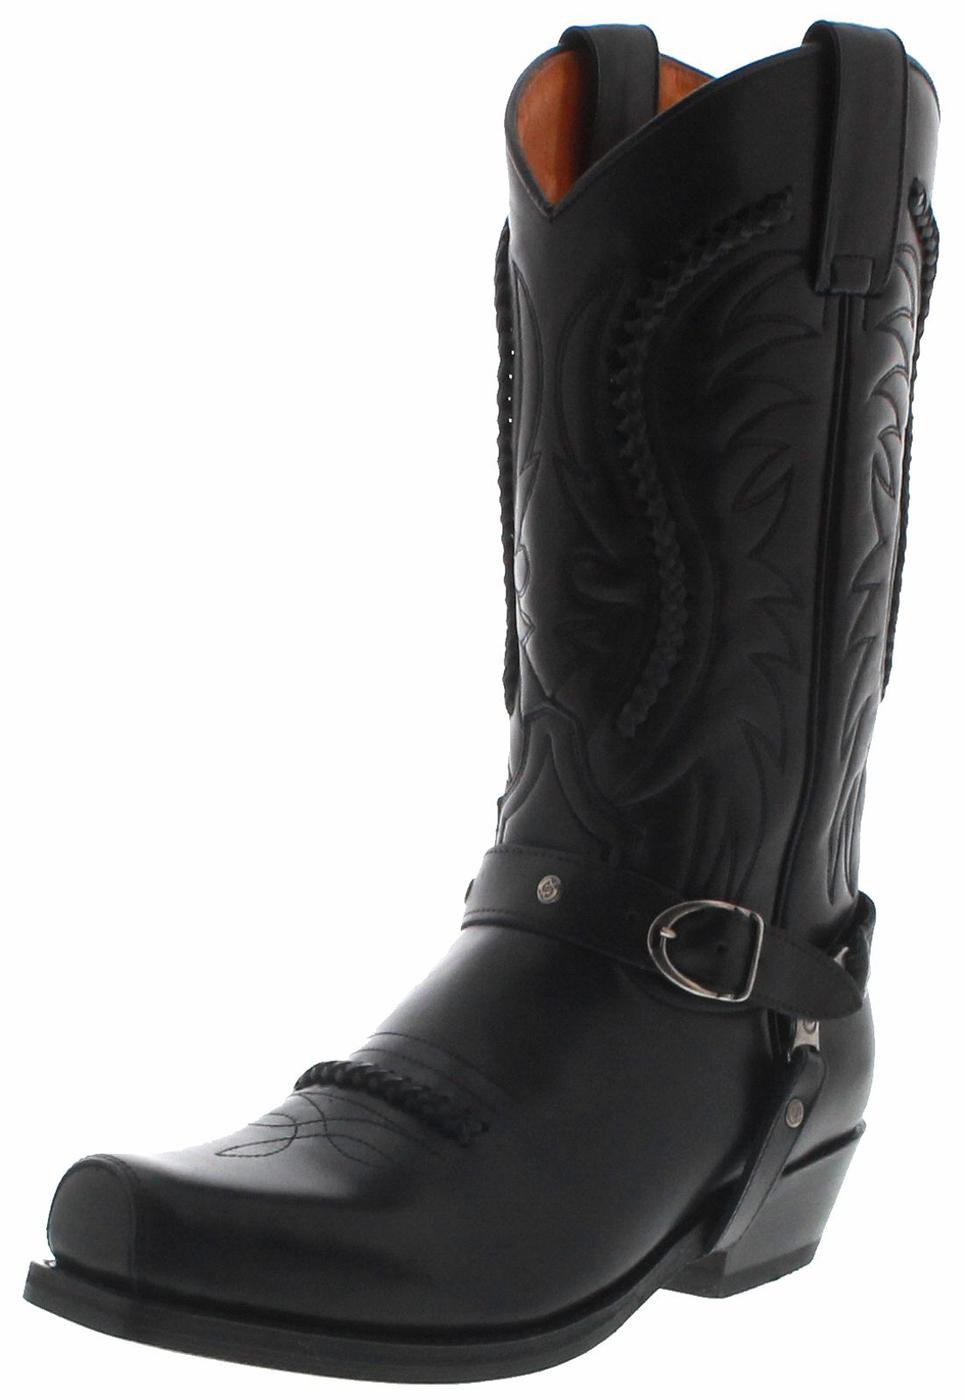 Sendra Boots 3434 Snowbut Negro cowboylaars - zwart